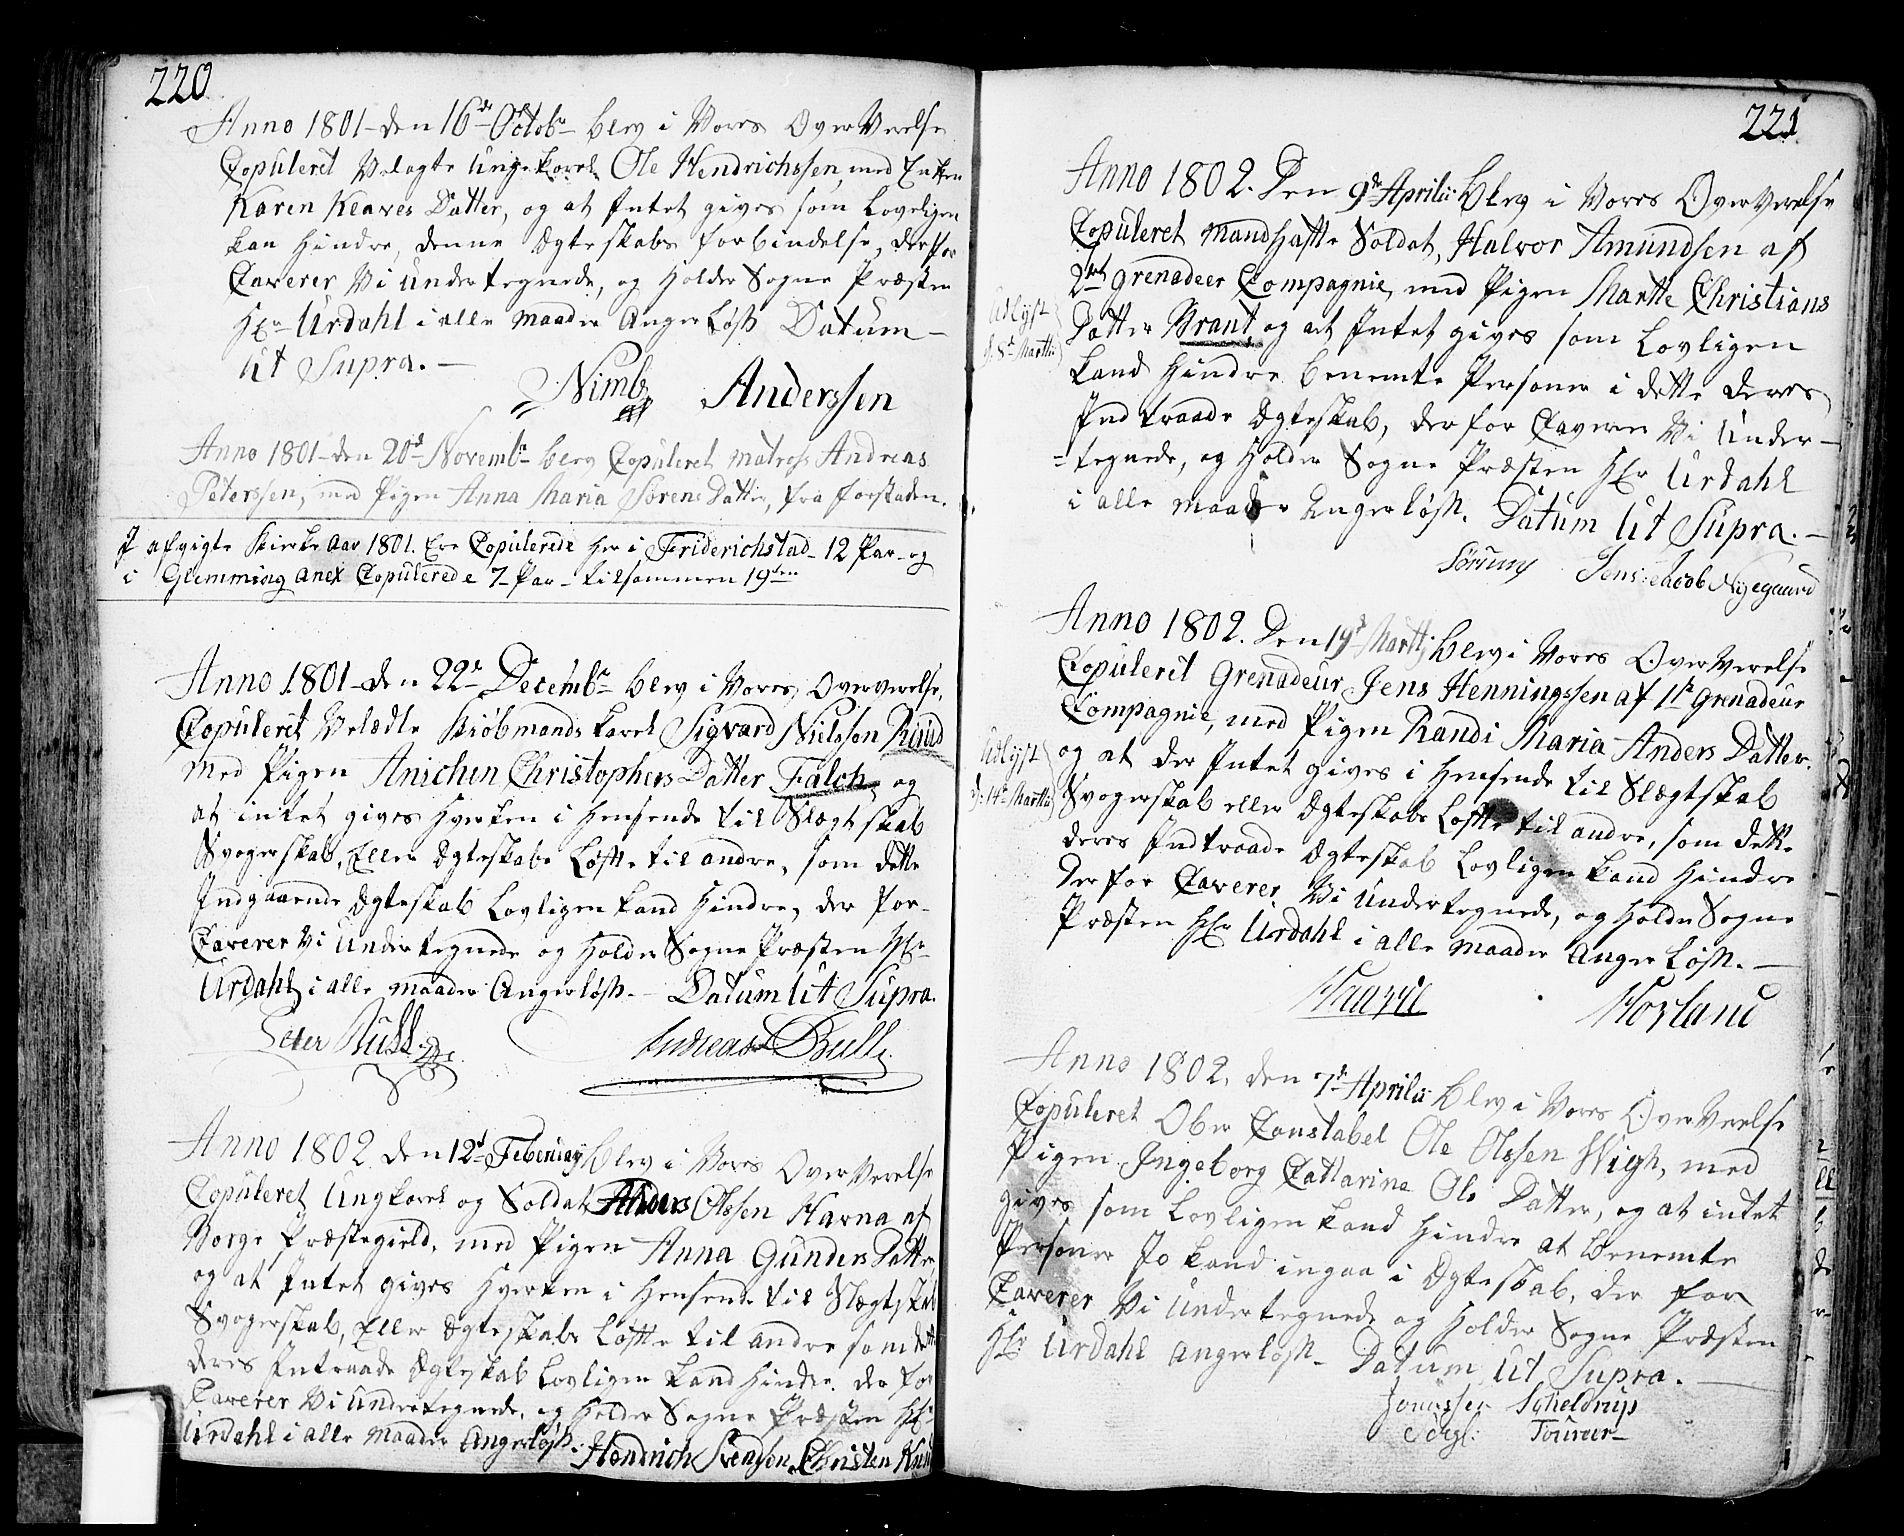 SAO, Fredrikstad prestekontor Kirkebøker, F/Fa/L0002: Parish register (official) no. 2, 1750-1804, p. 220-221